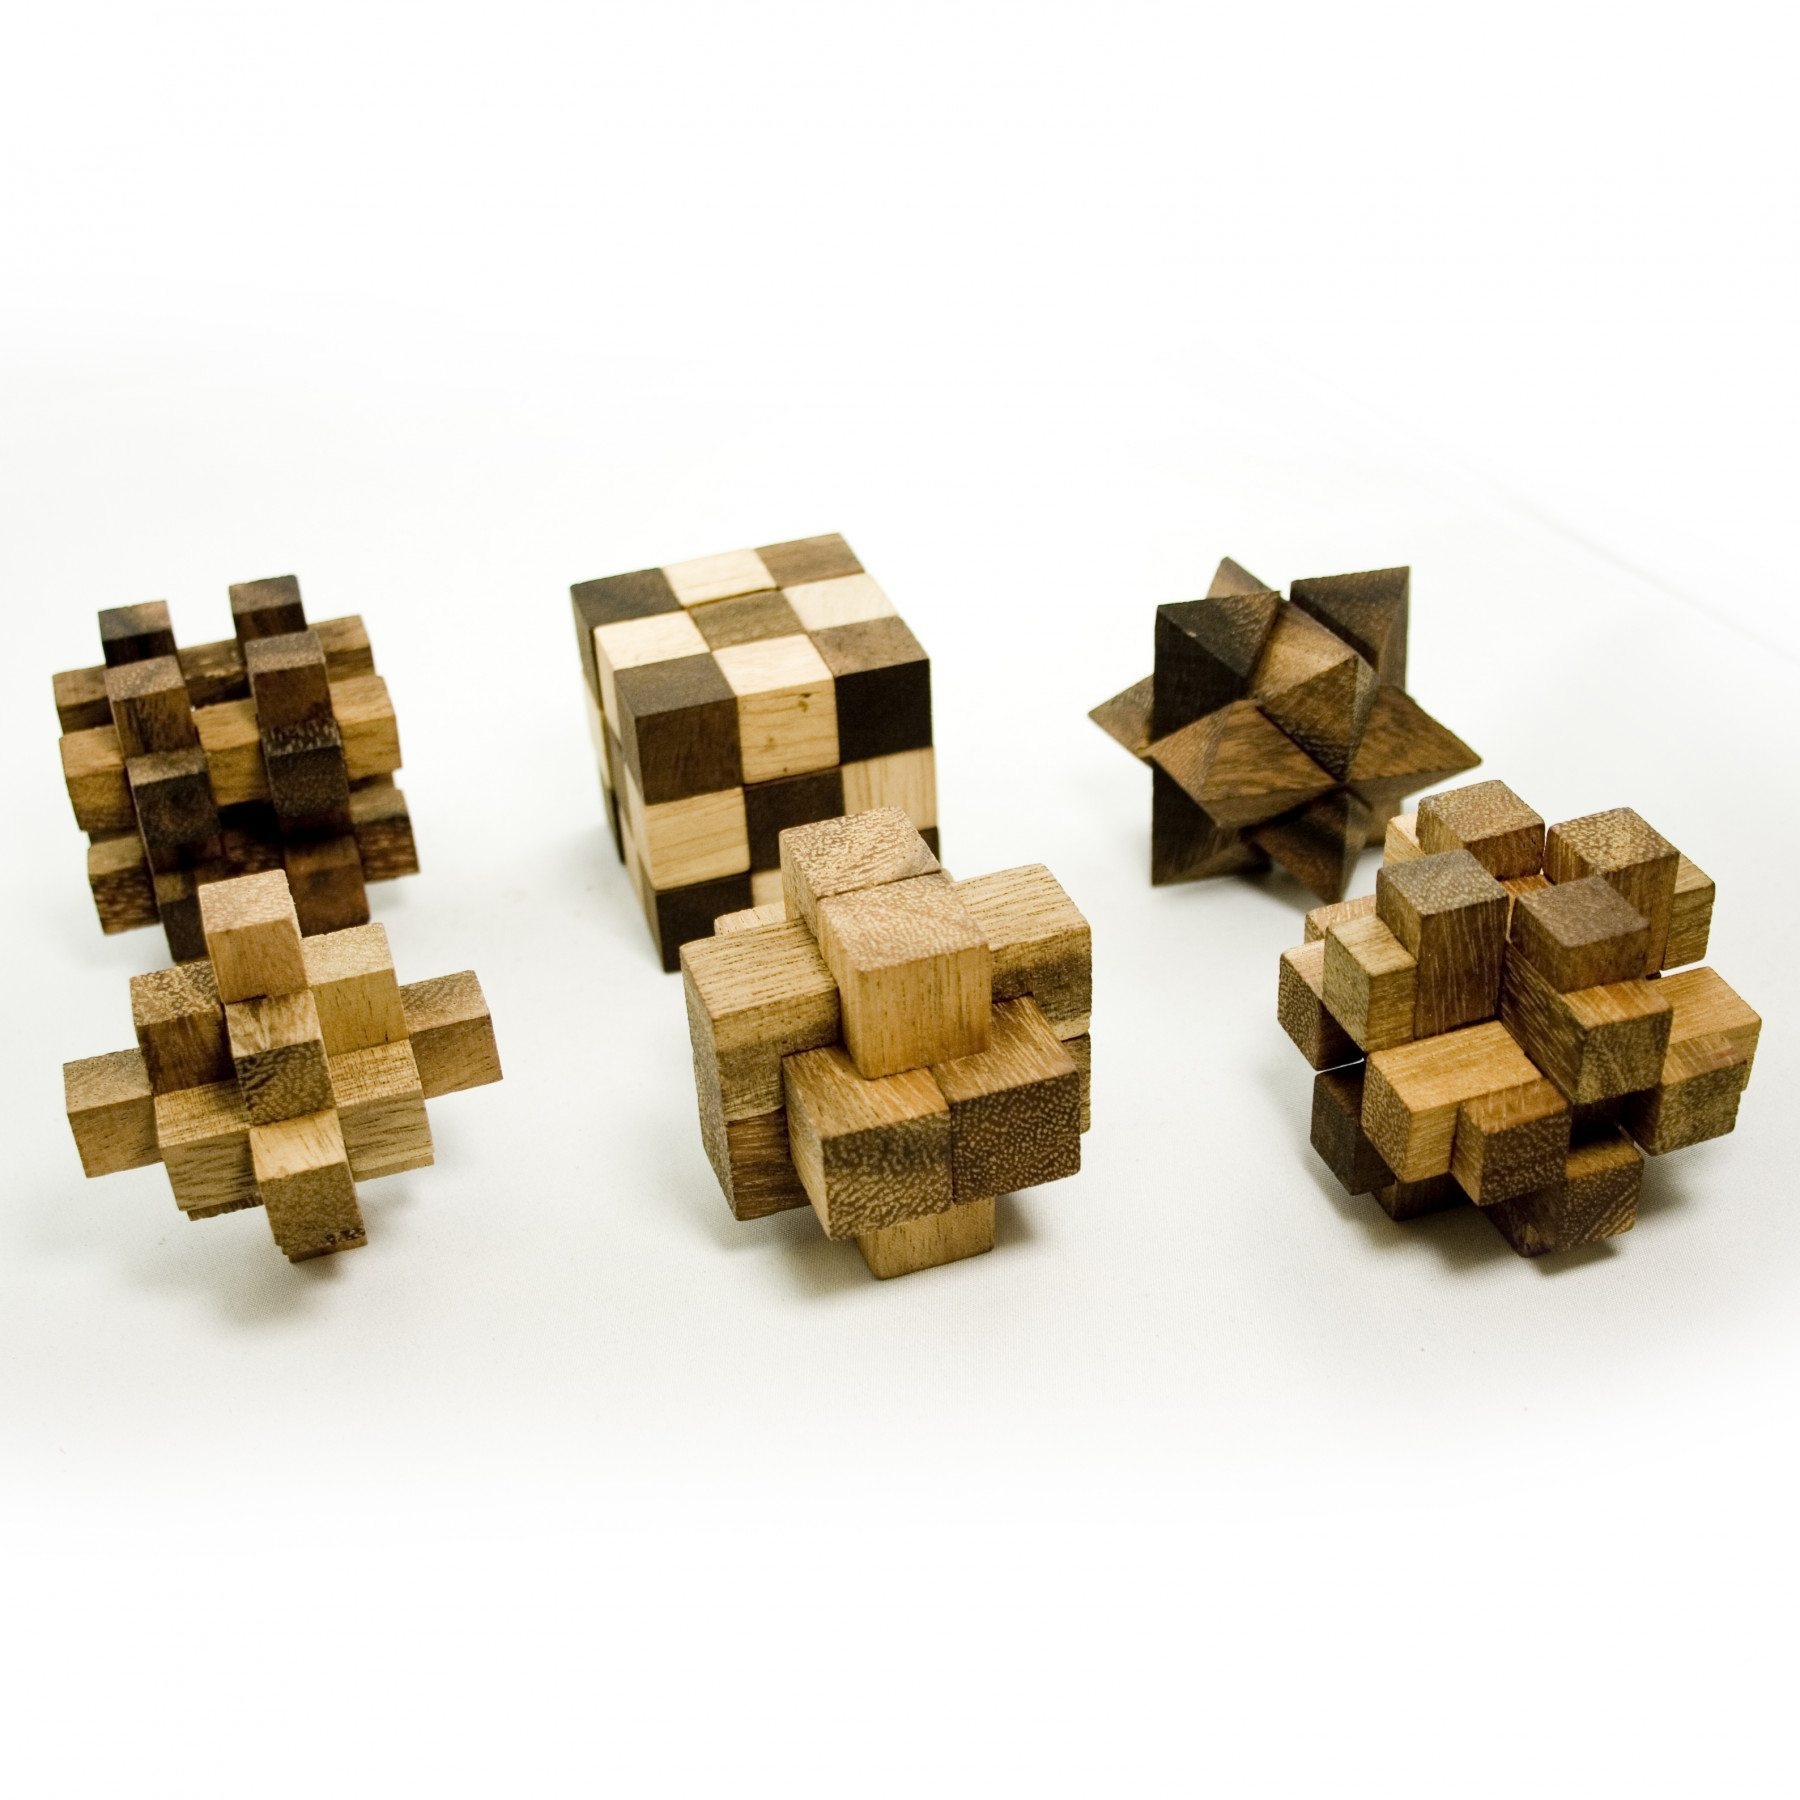 IQ Master Knobelspiele Set in edler Holzbox - 6 Spiele